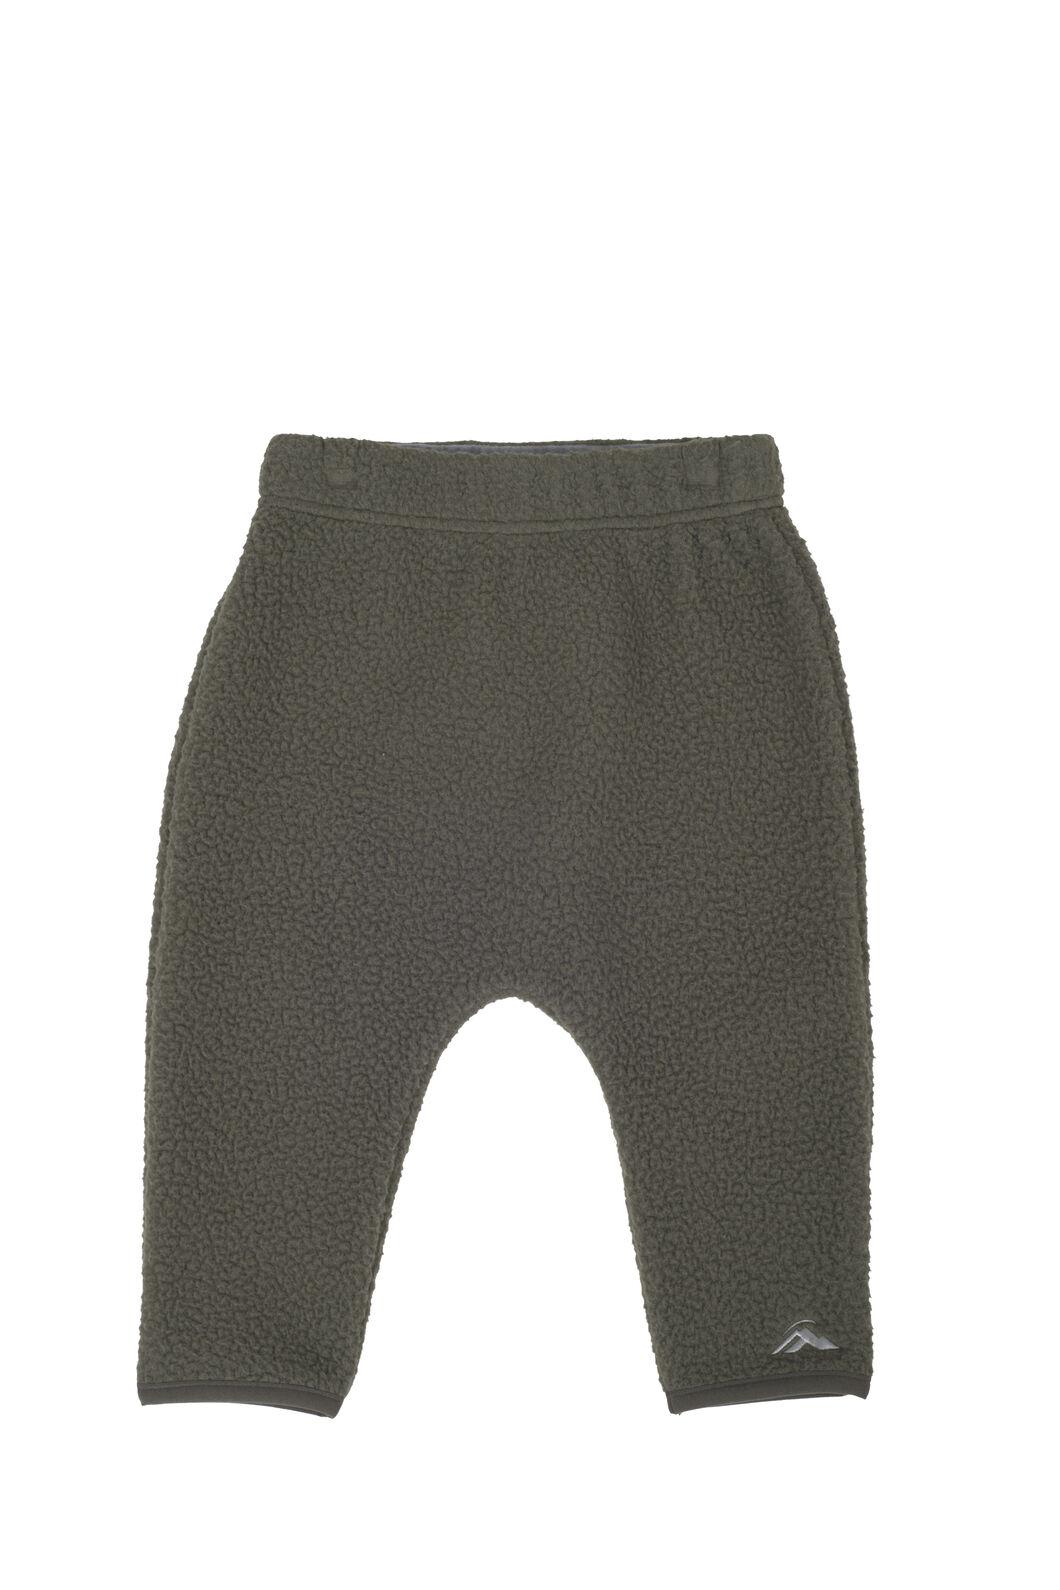 Macpac Acorn Fleece Pants - Baby, Grape Leaf, hi-res